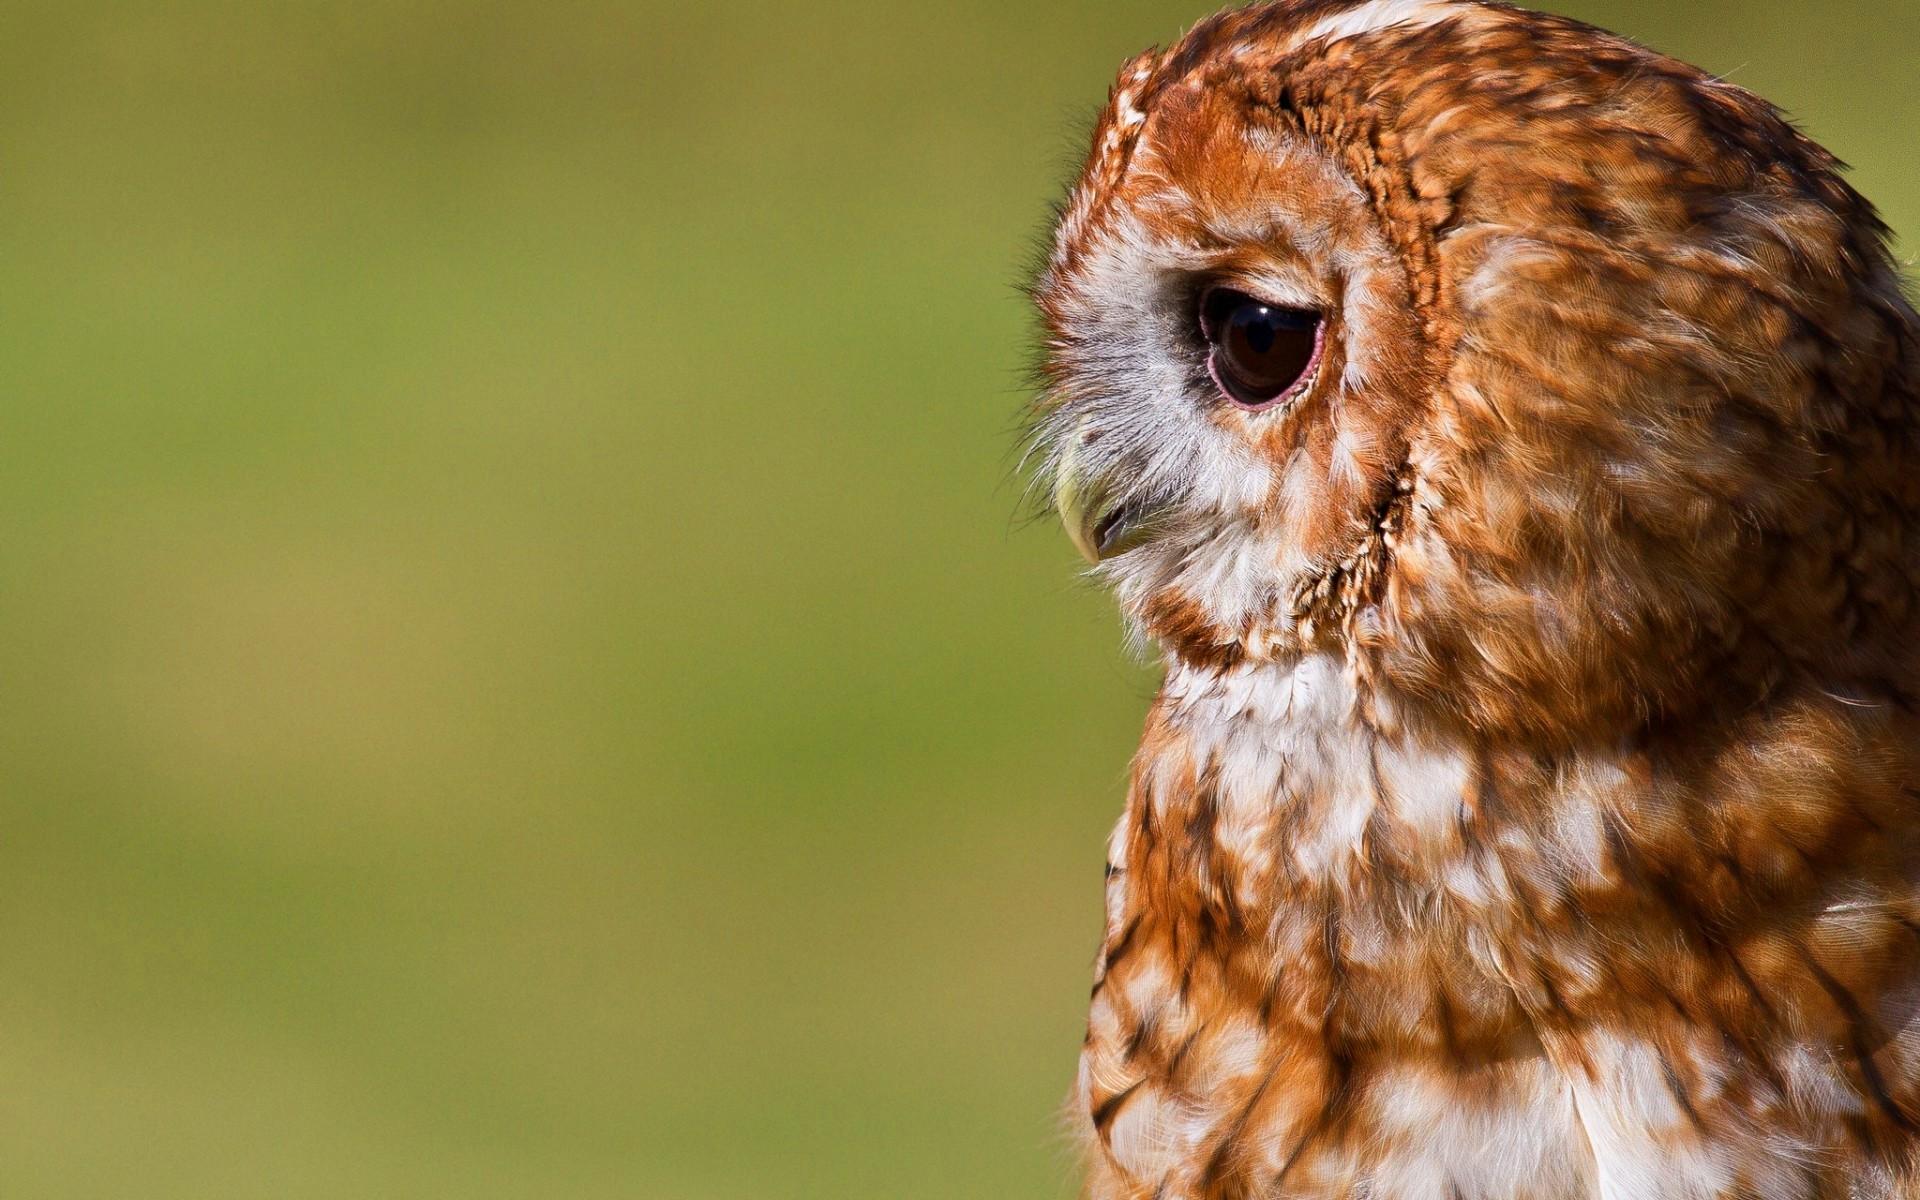 cute owl wallpaper 15768